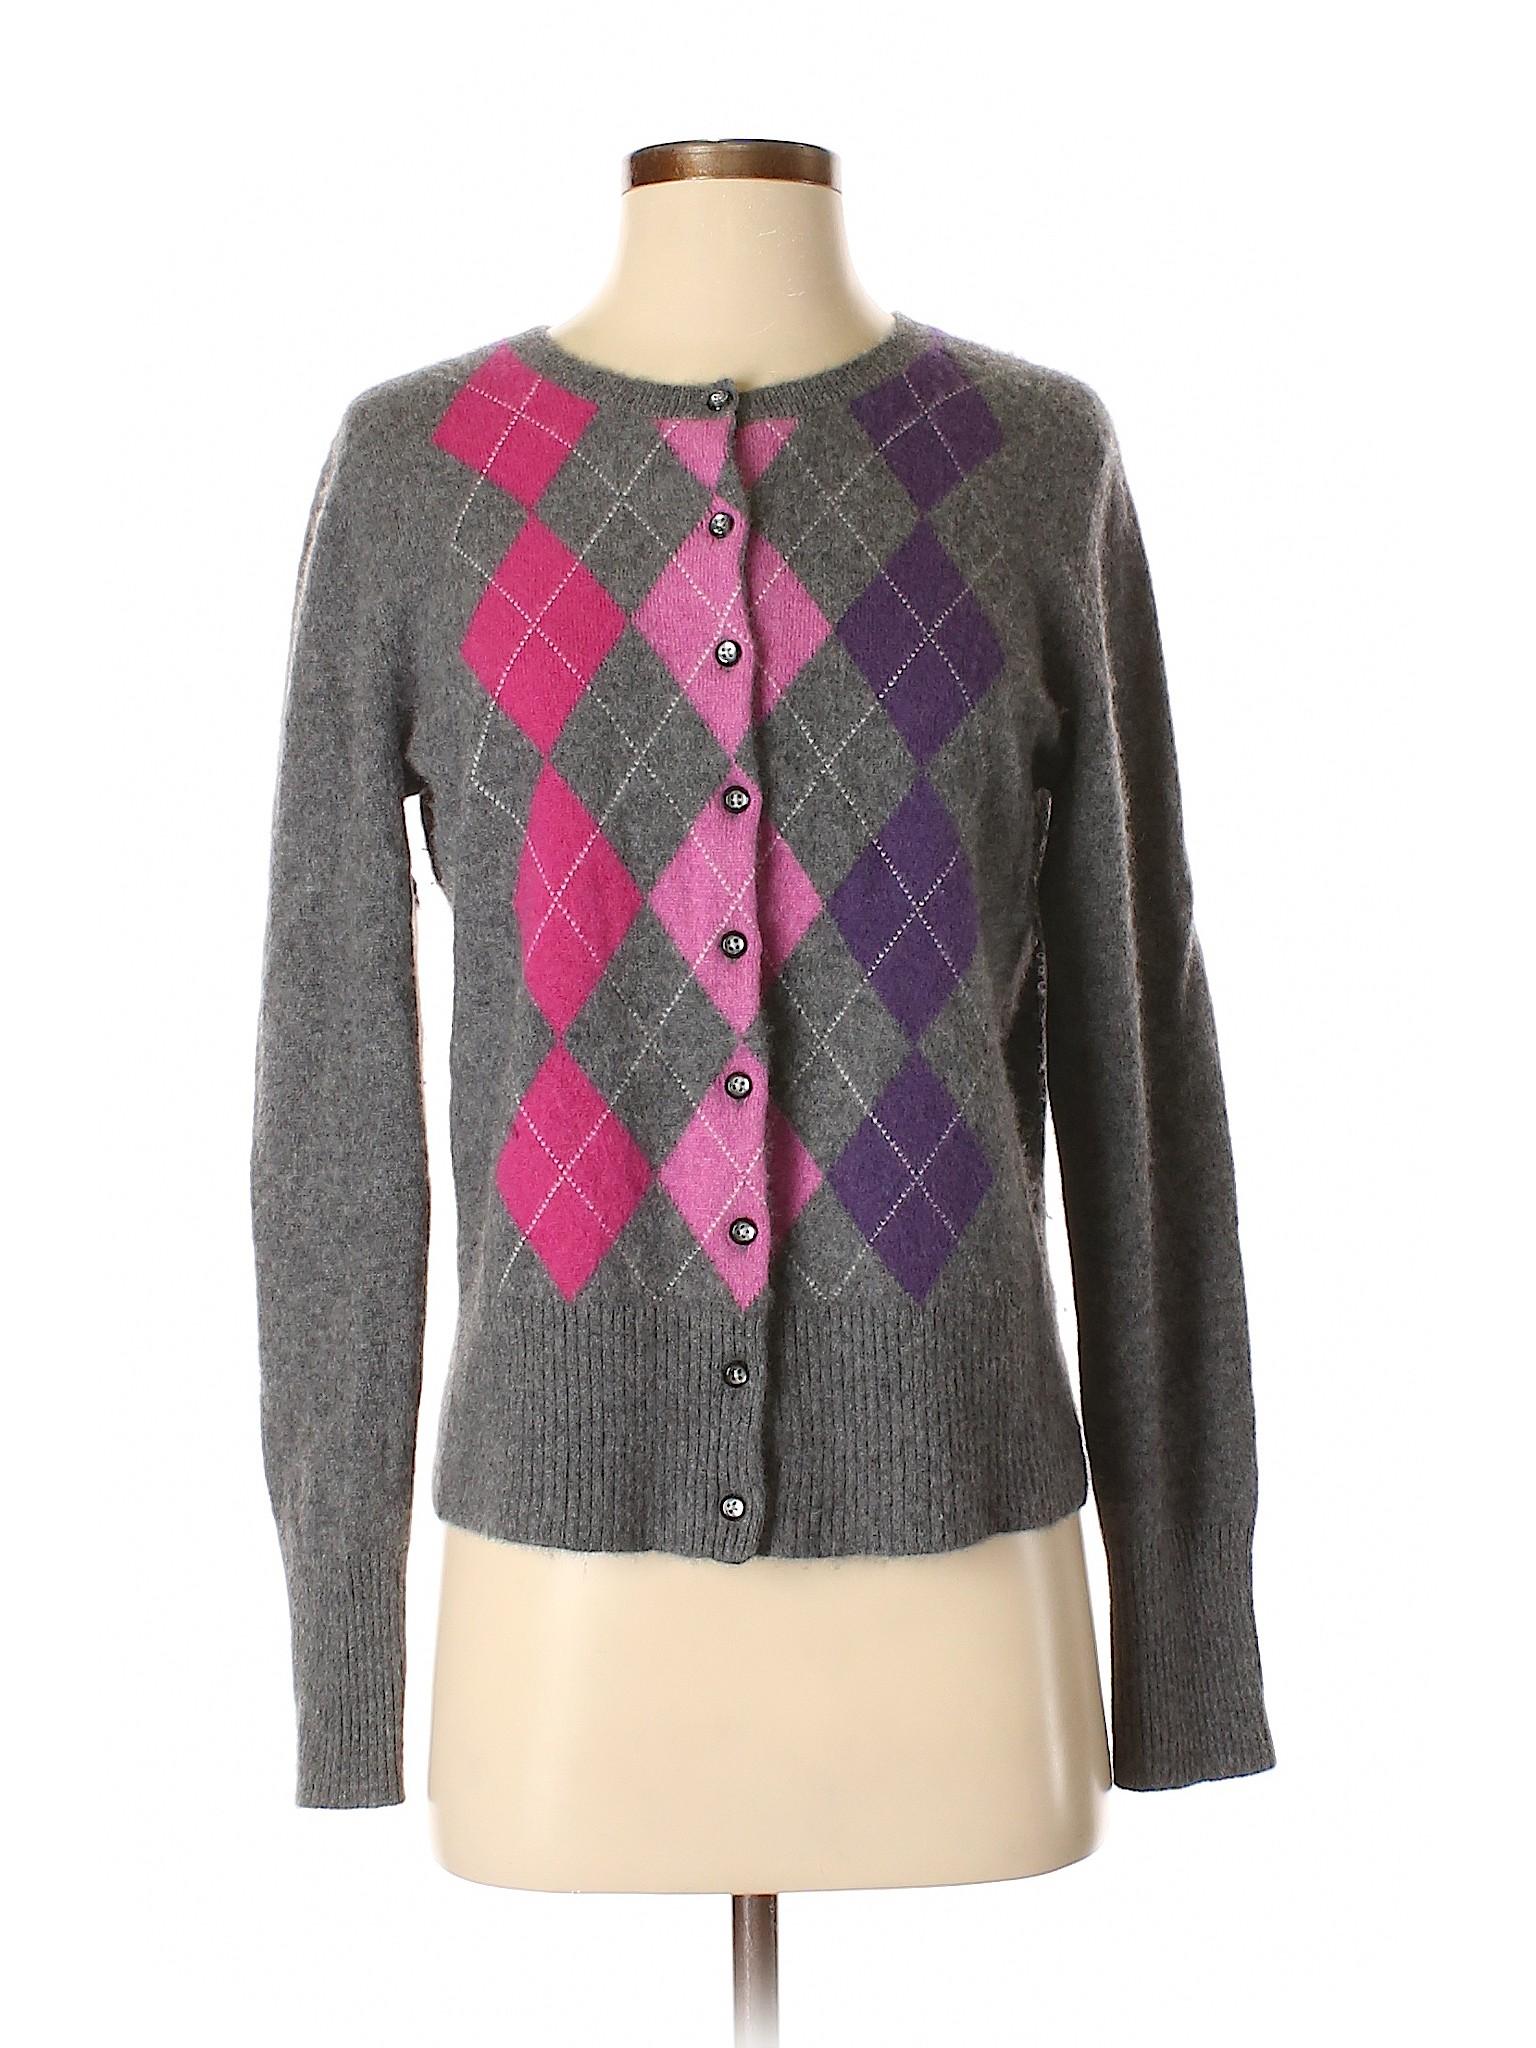 Cardigan Boutique winter Apt Cashmere 9 wnYH4q